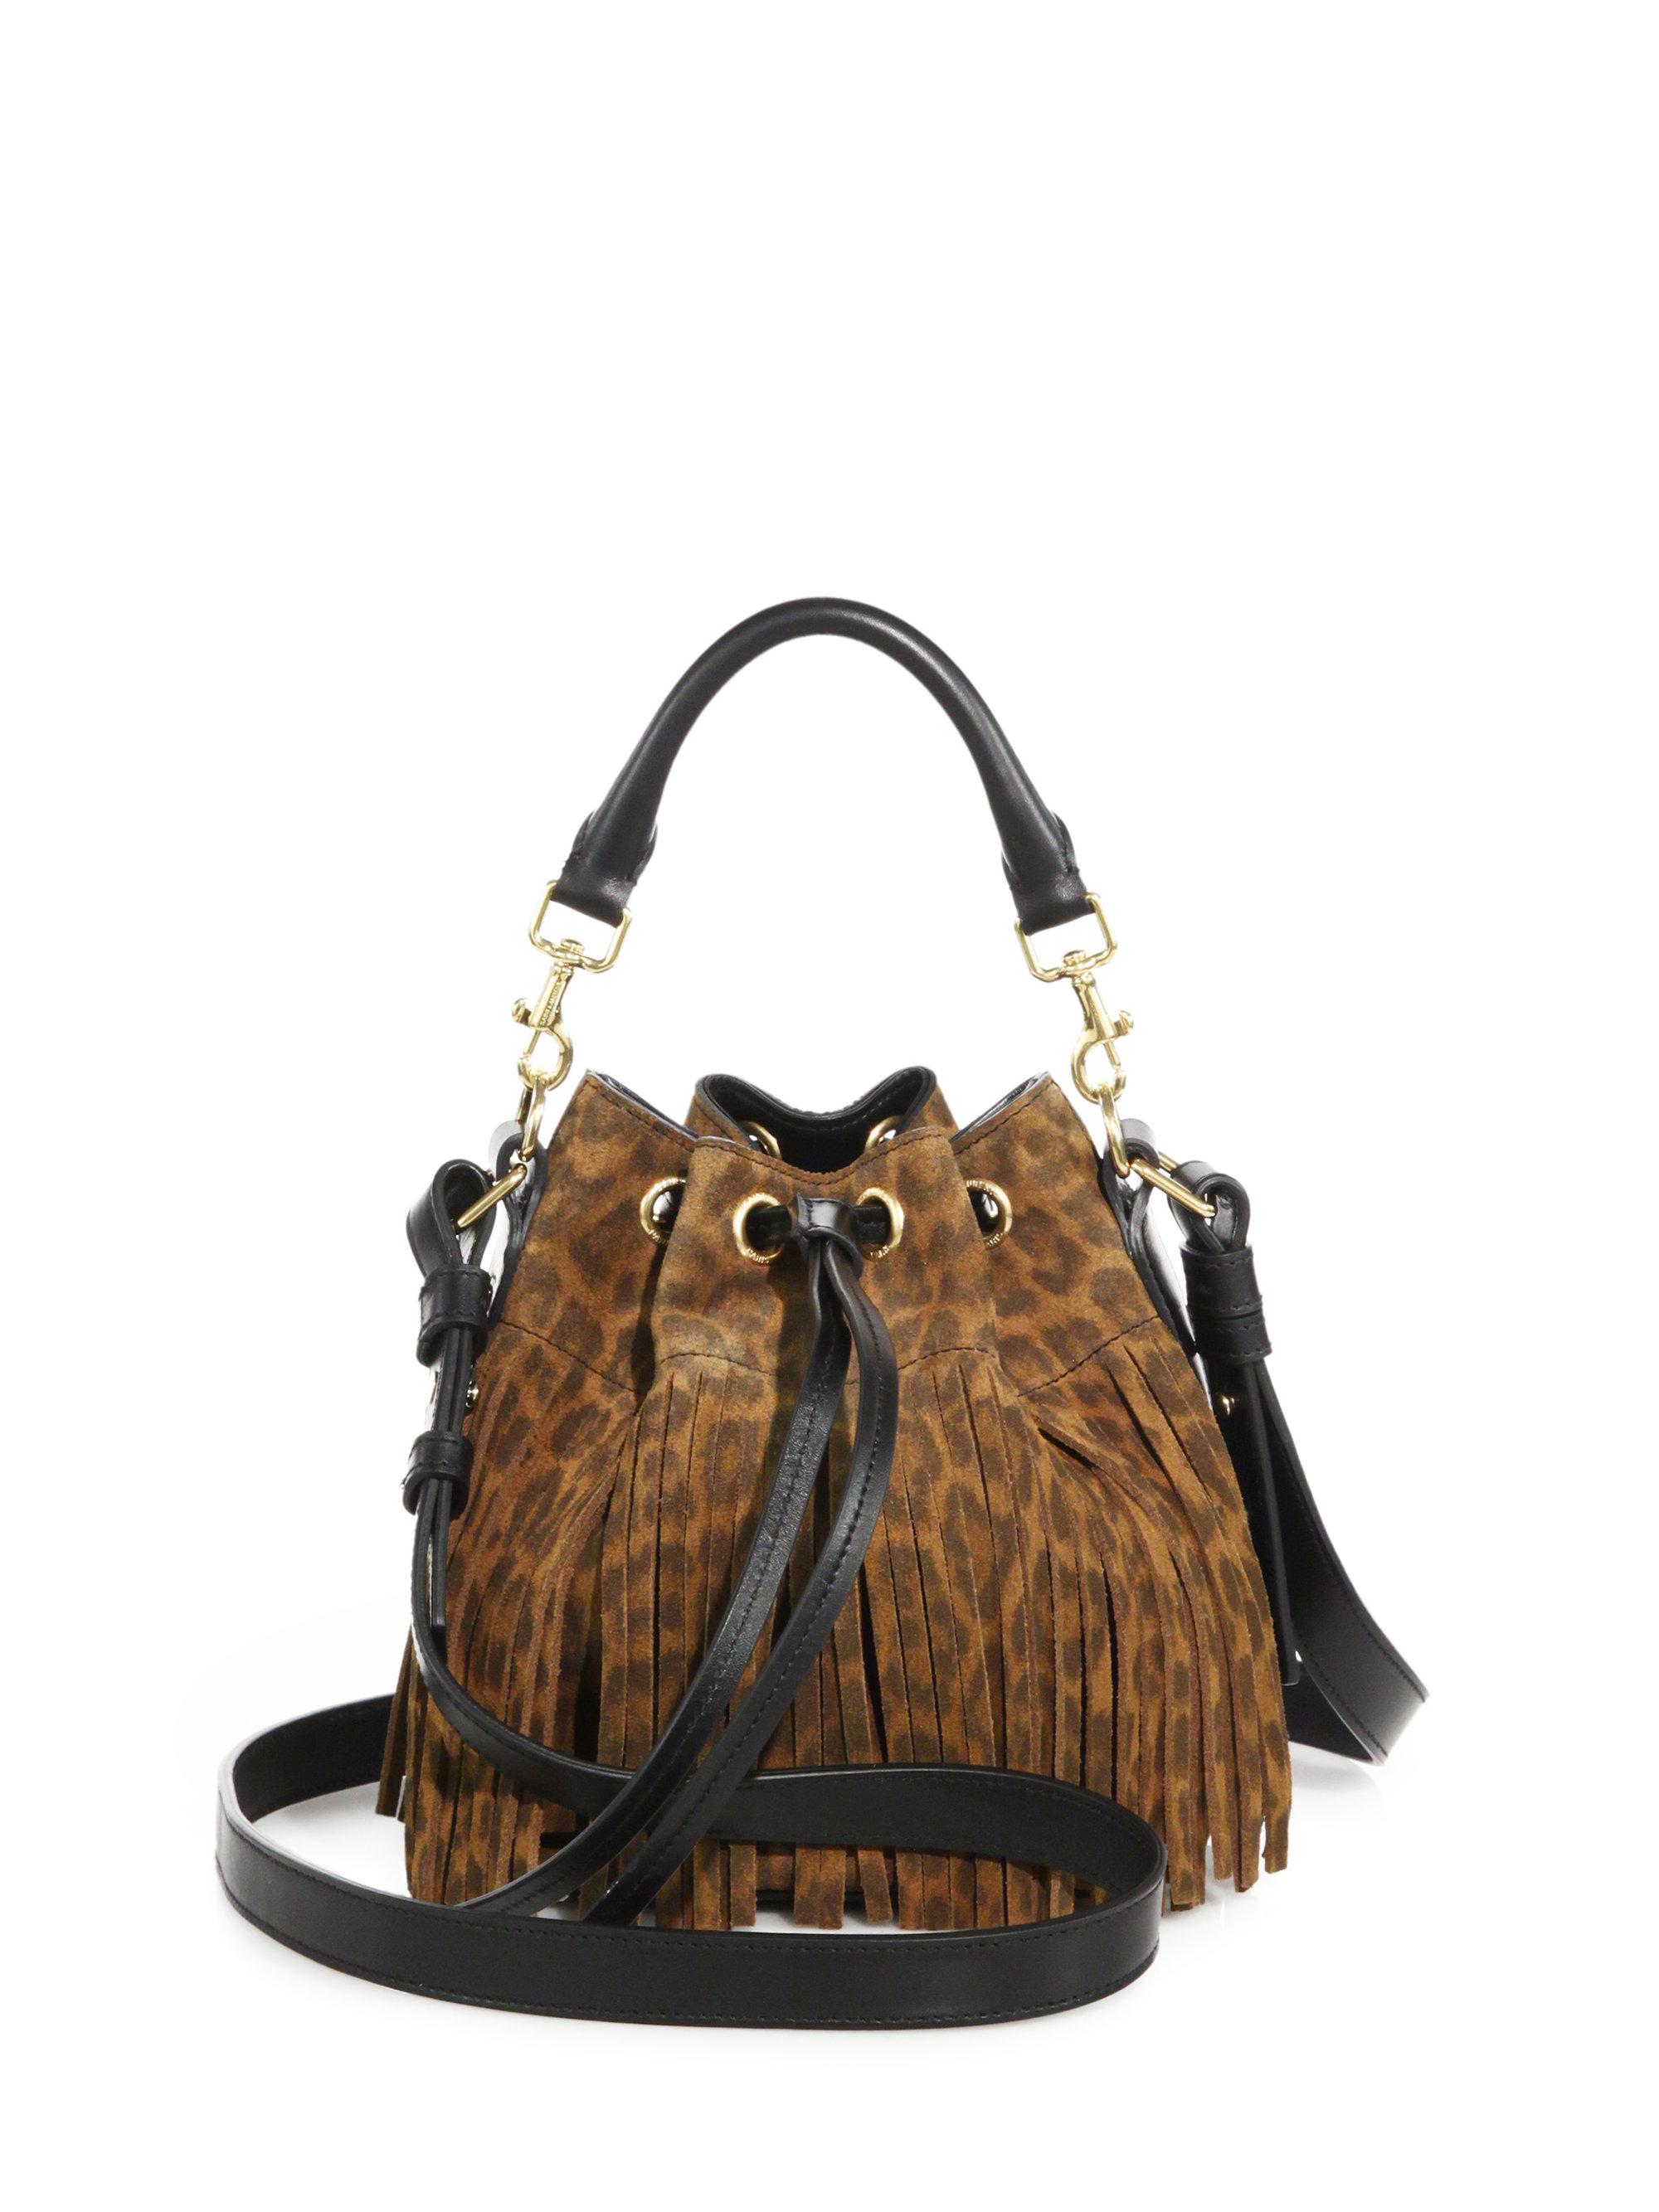 ysl outlet usa - Saint laurent Small Leopard-print Suede Fringe Bucket Bag in ...